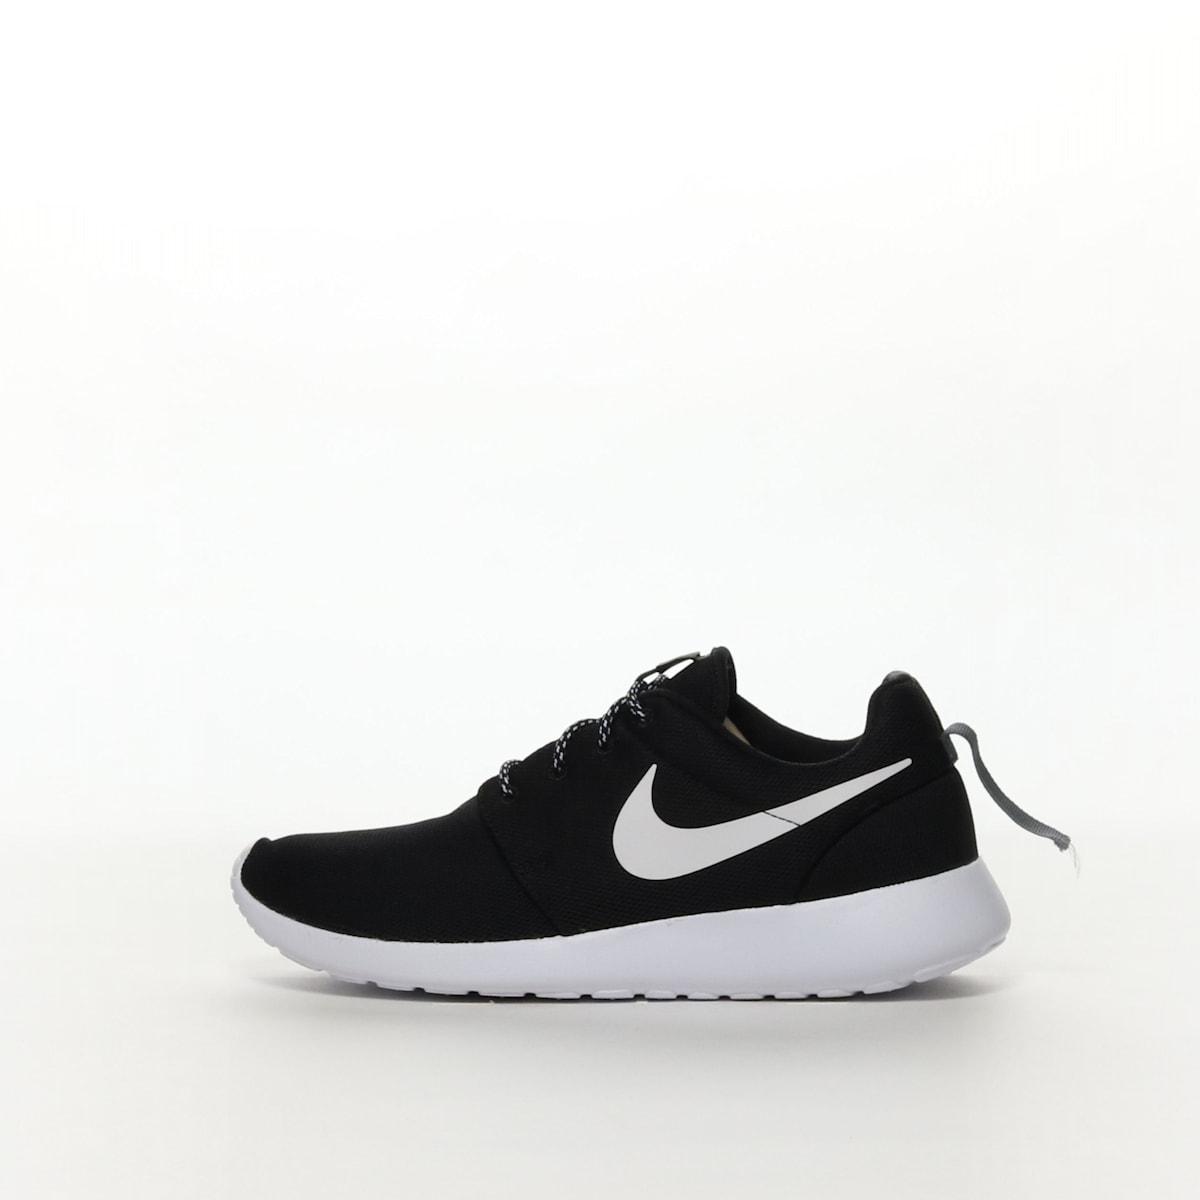 80a2107b35e55 Women s Nike Roshe 1 Shoe - BLACK WHITE – Resku